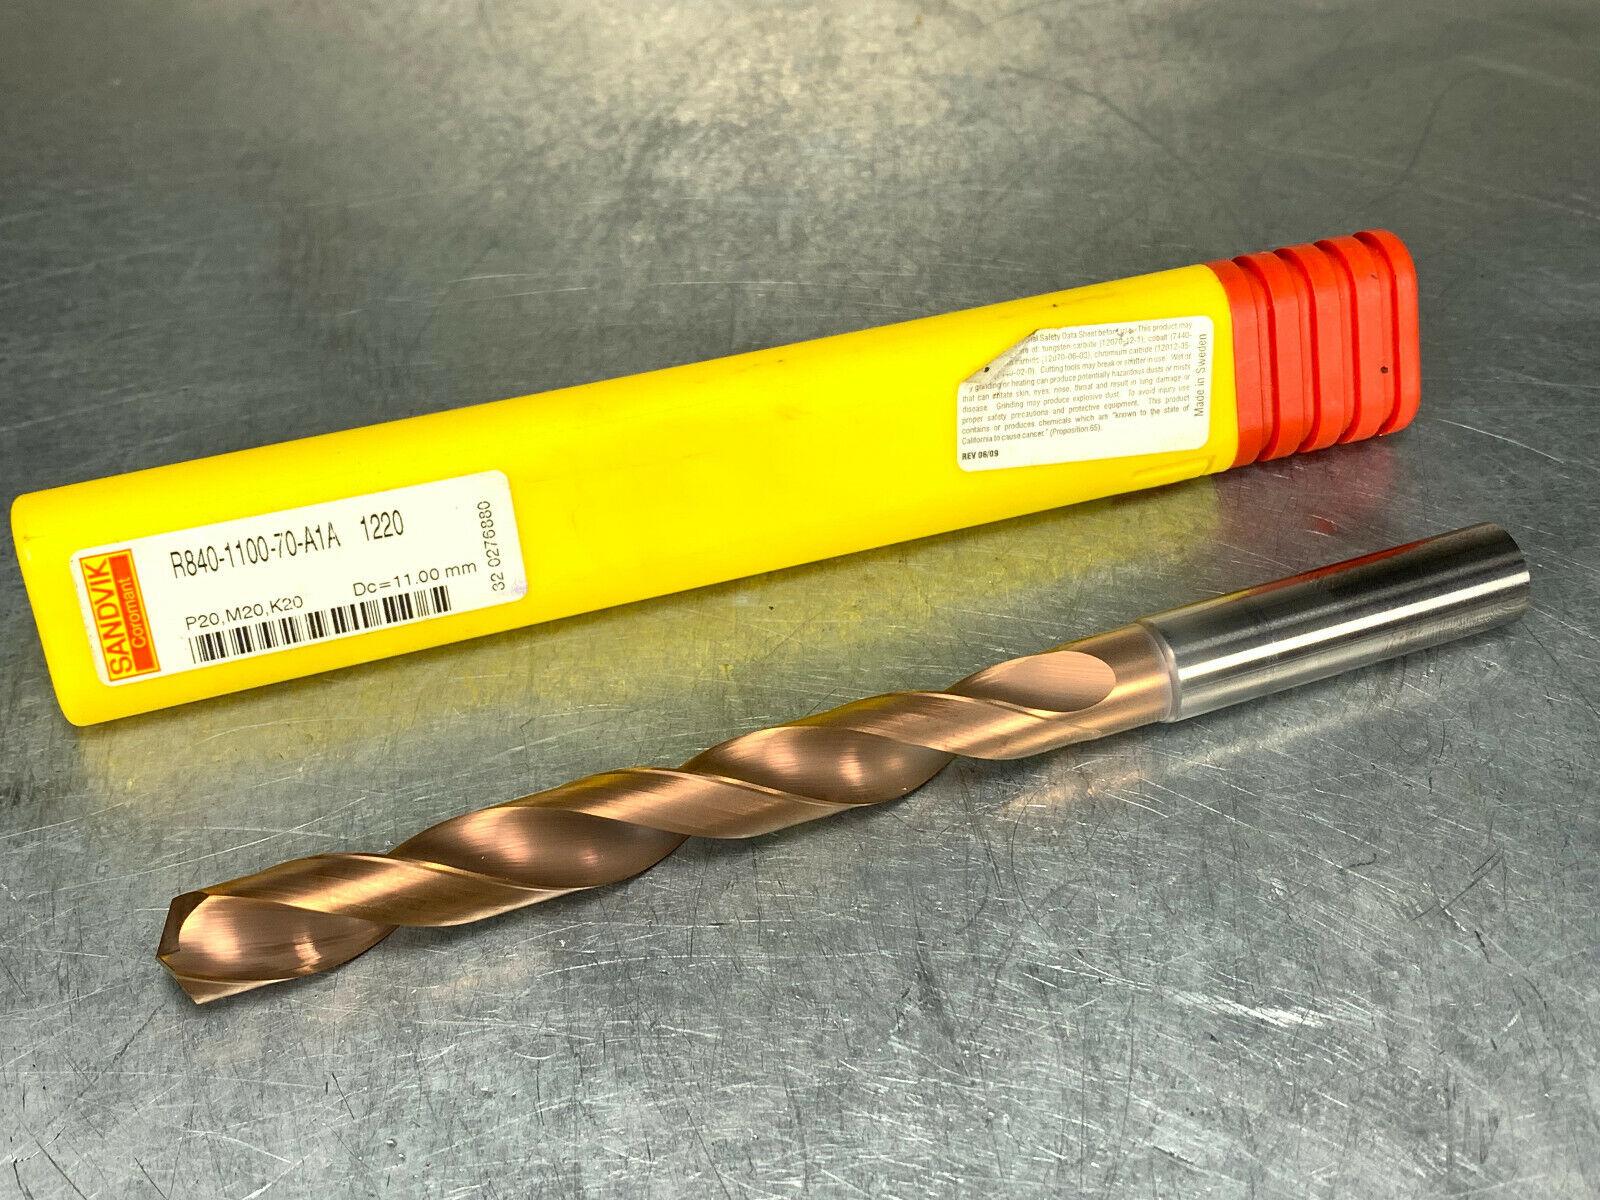 "SANDVIK Carbide Coolant Jobber Drill 7.3mm 0.2874/"" 144° TiAlN 4234 860.1-0730..."